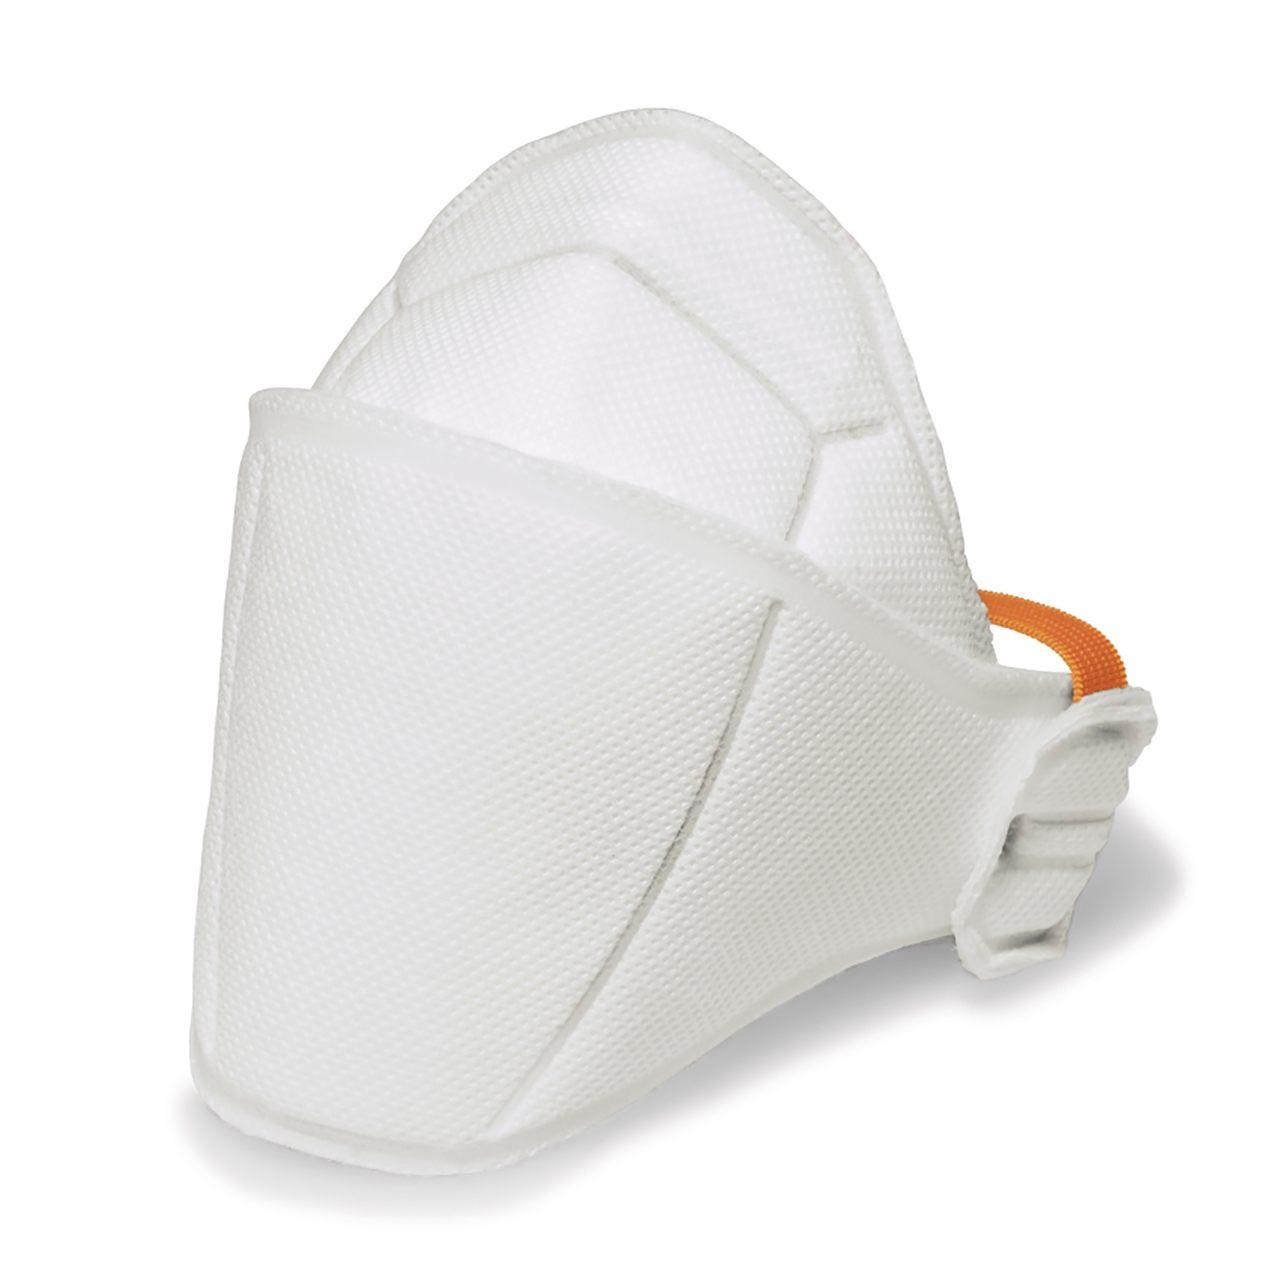 Masker Antivirus Terbaik dari uvex - uvex Silv-Air 5200 Premium FFP2